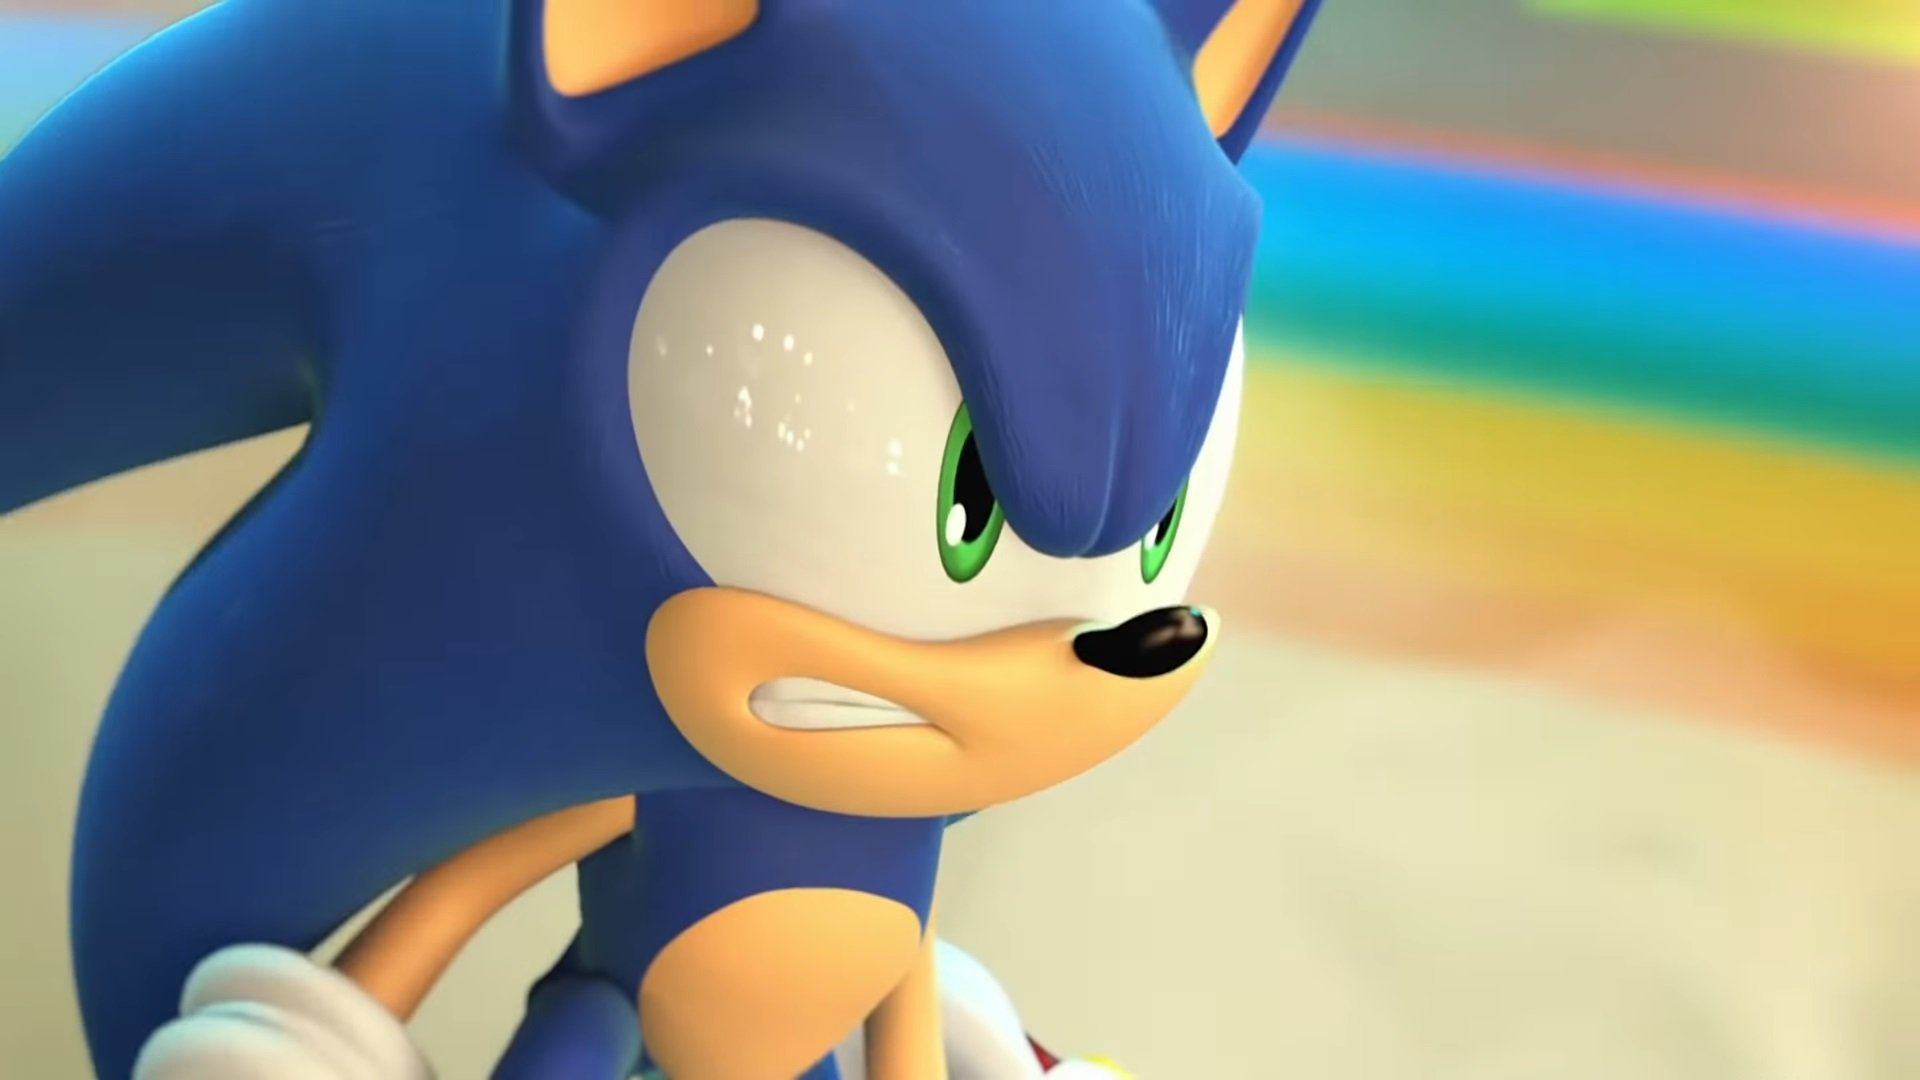 sega newgame earlyaccess colors videogame releasedate release access